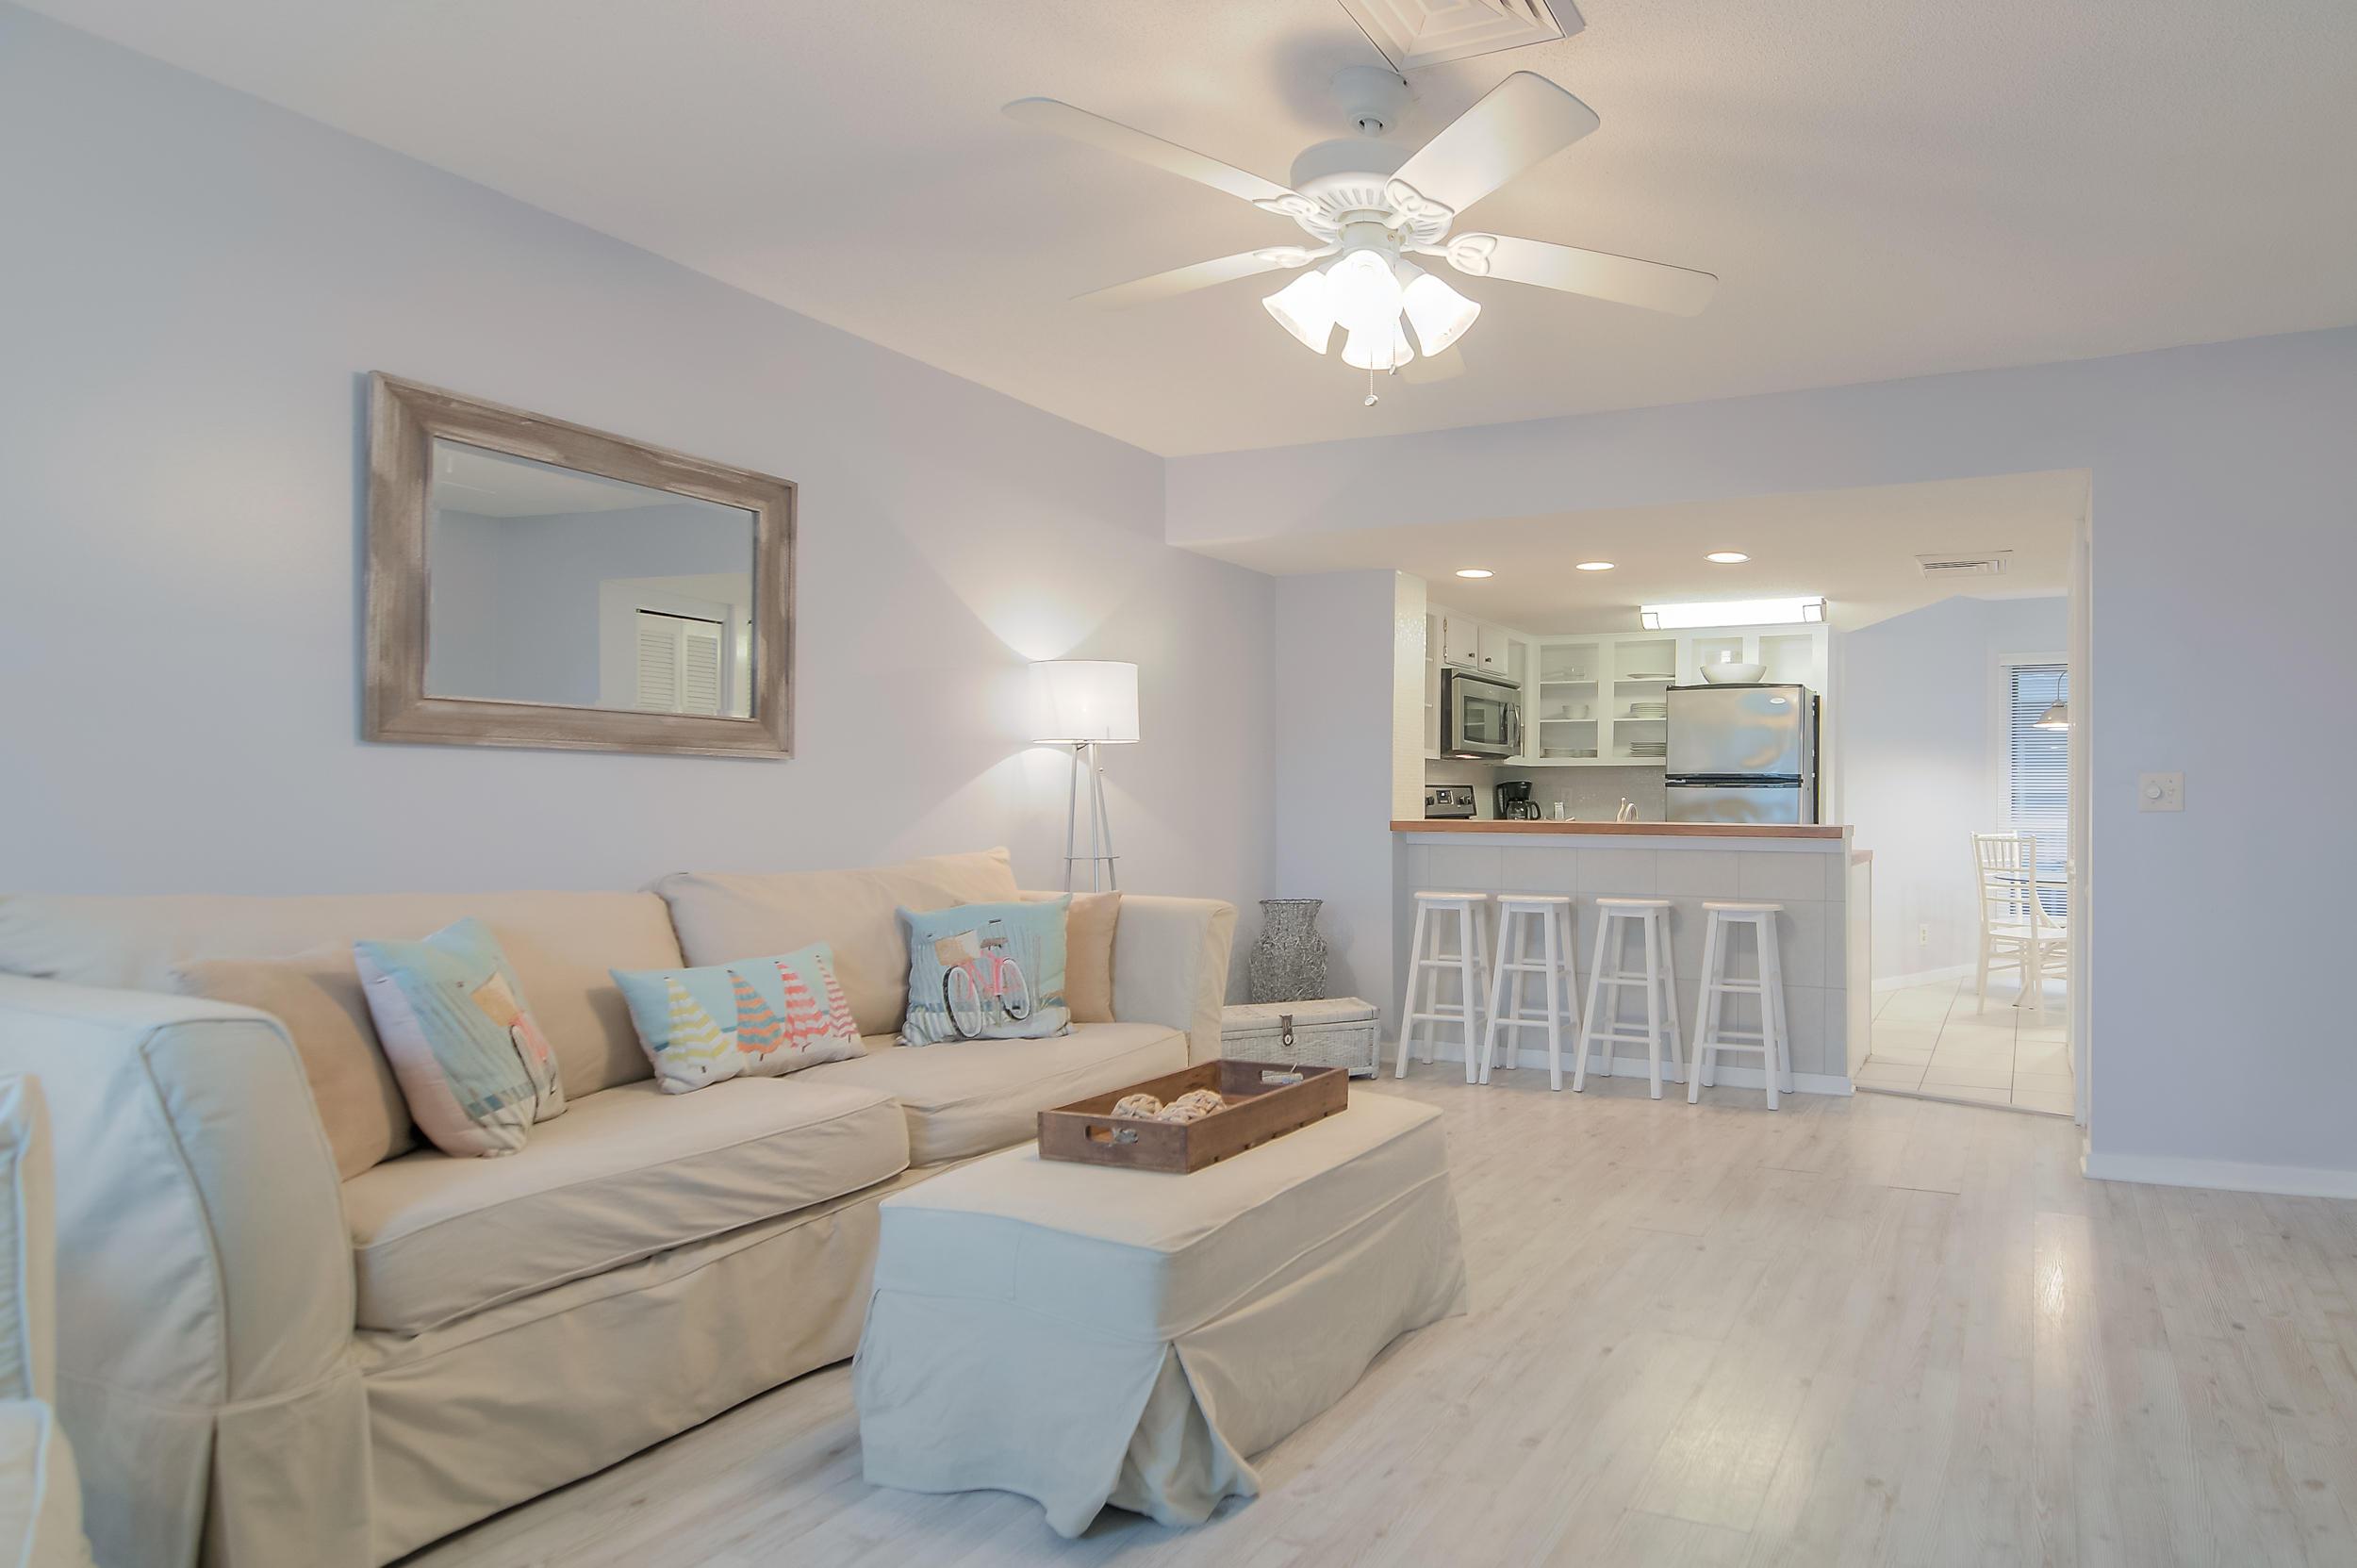 Port Ocall Homes For Sale - 103 Port O Call, Isle of Palms, SC - 7